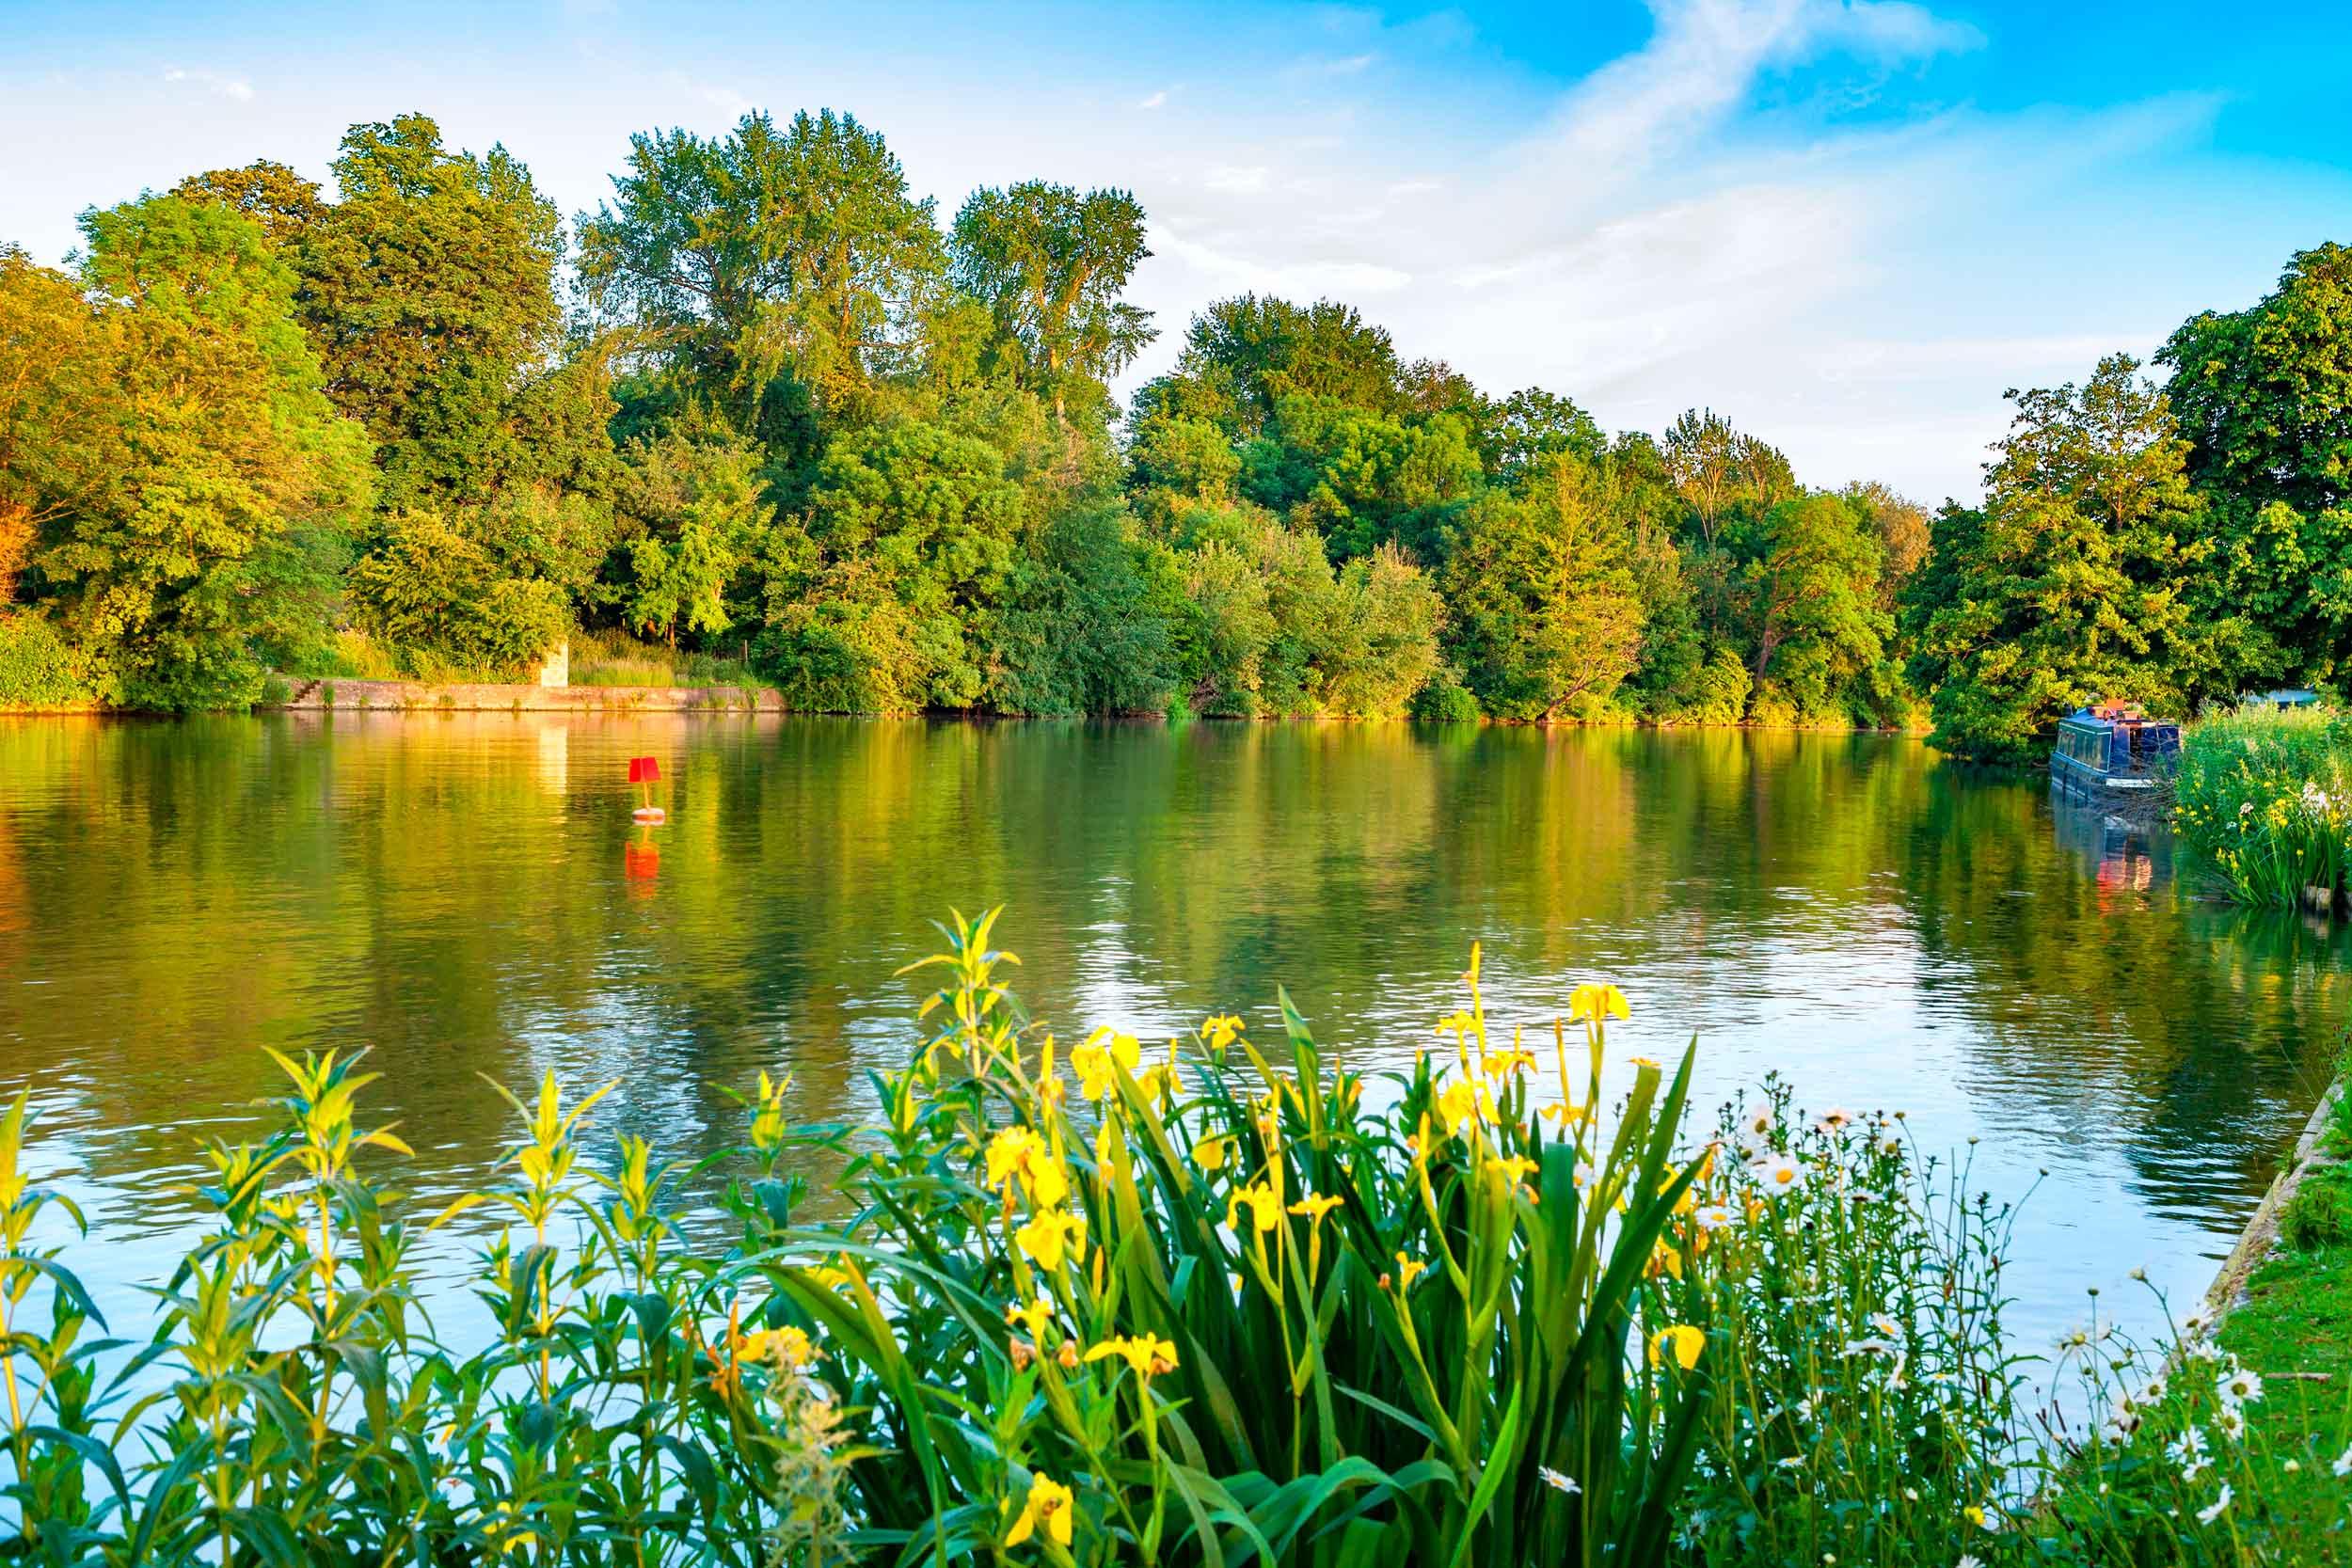 Iffley Lock on the River Thames, Oxford  (Andrei Nekrassov/Shutterstock)